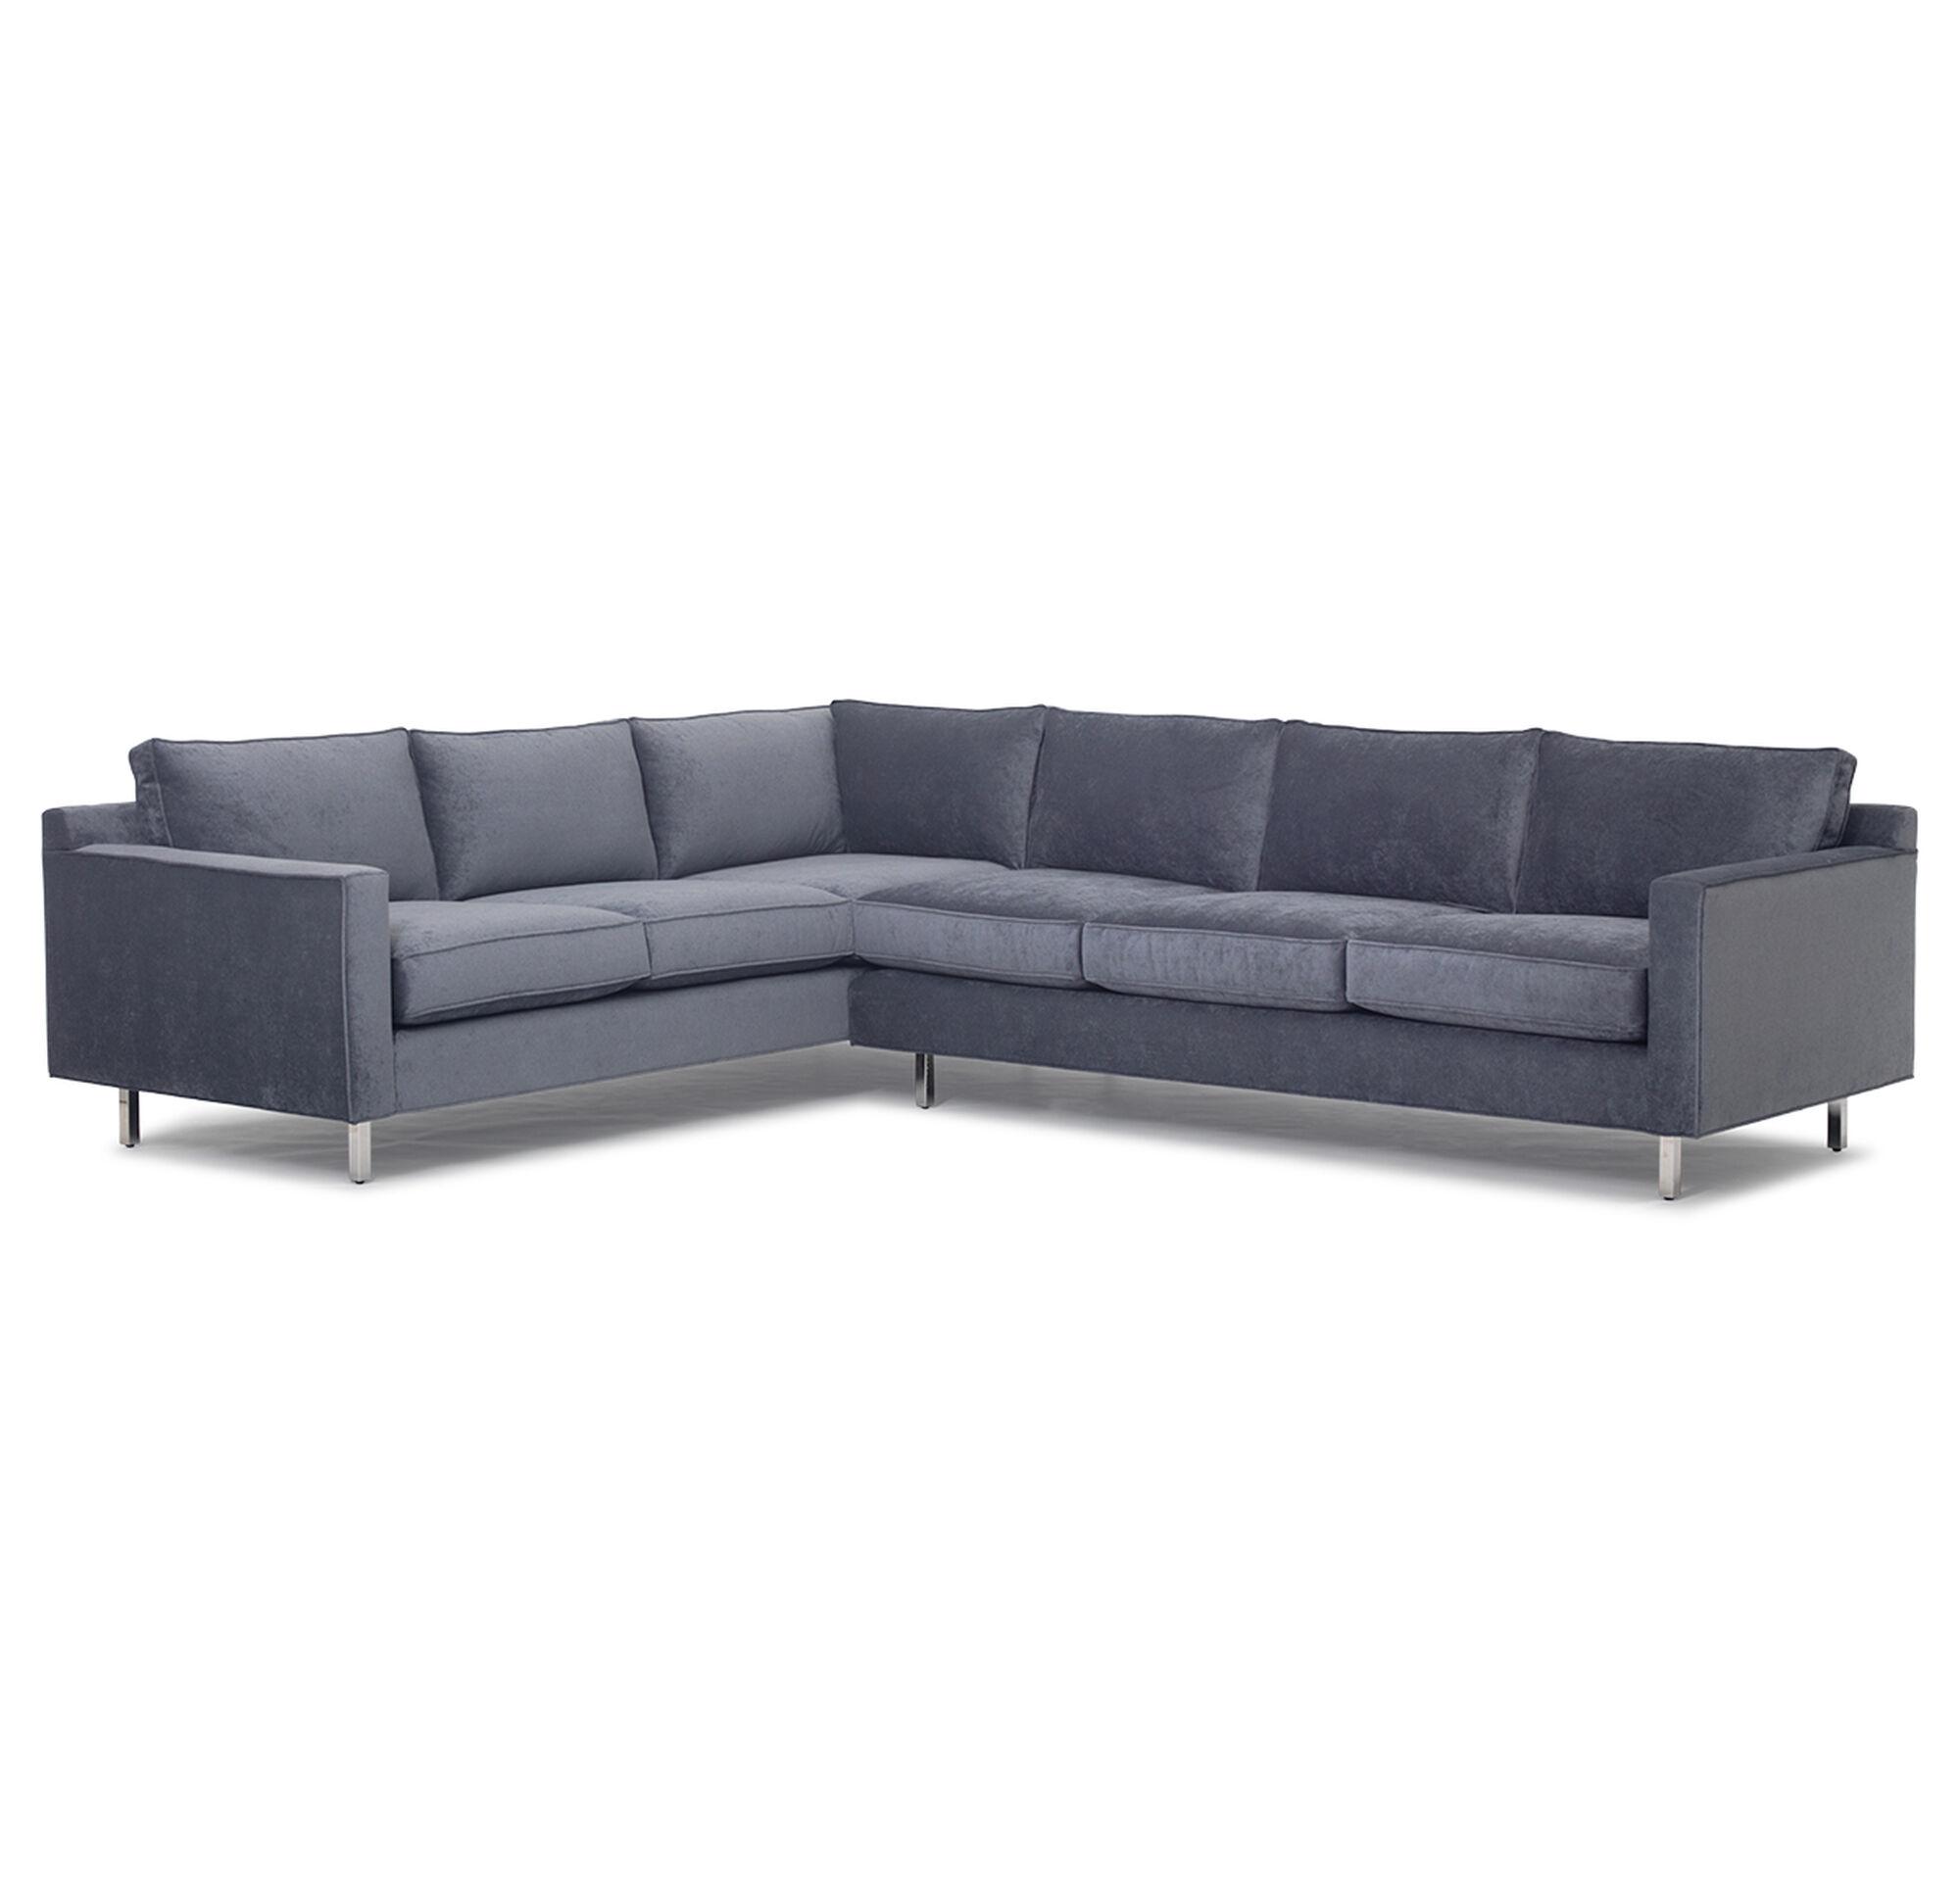 Hunter studio sectional sofa for Sectional sofa hawaii